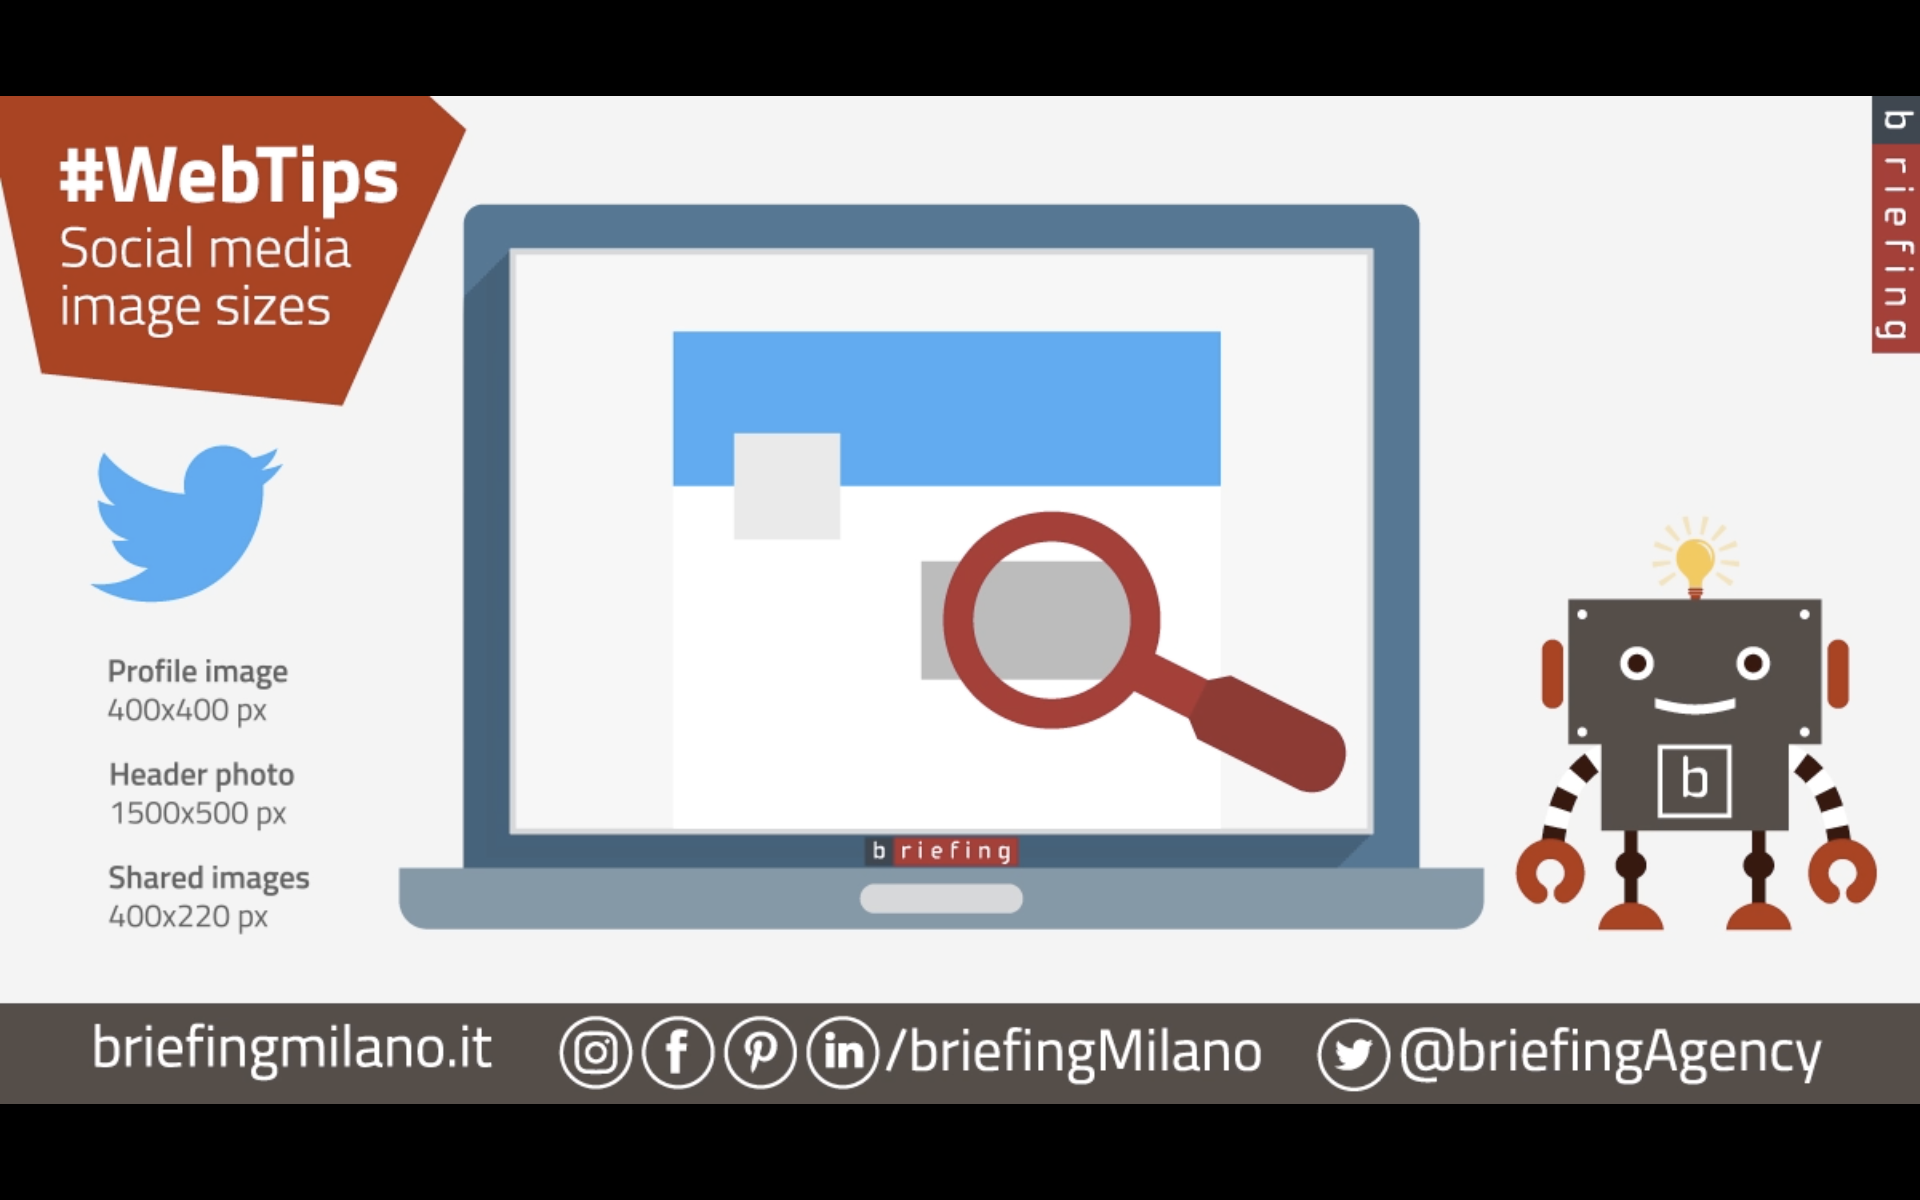 BriefingMilano social media sizes